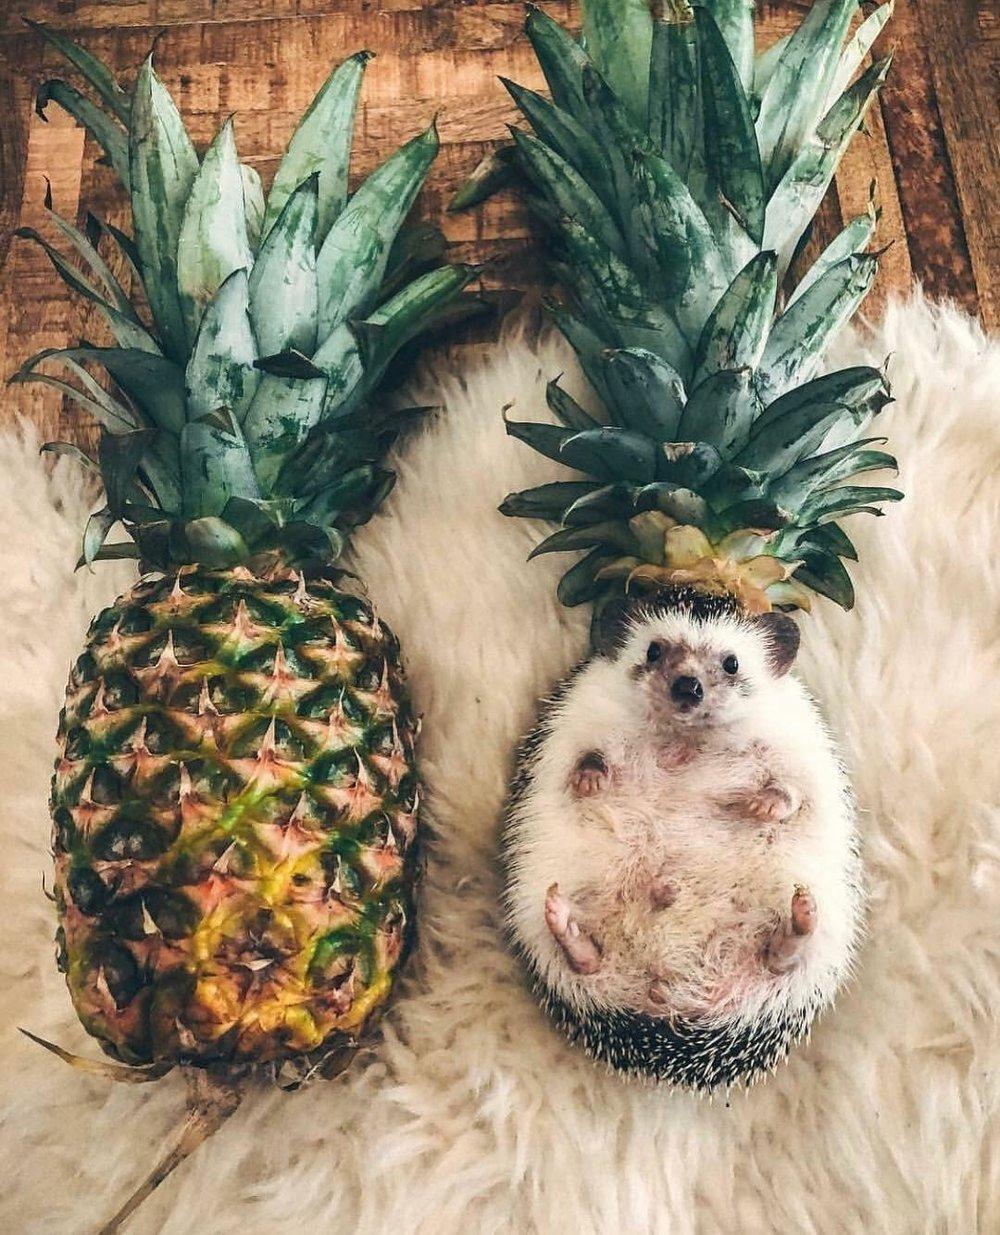 putyouinabettermood :     Prickly fruit via  https://ift.tt/2J6oAKk  putyouinabettermood.com